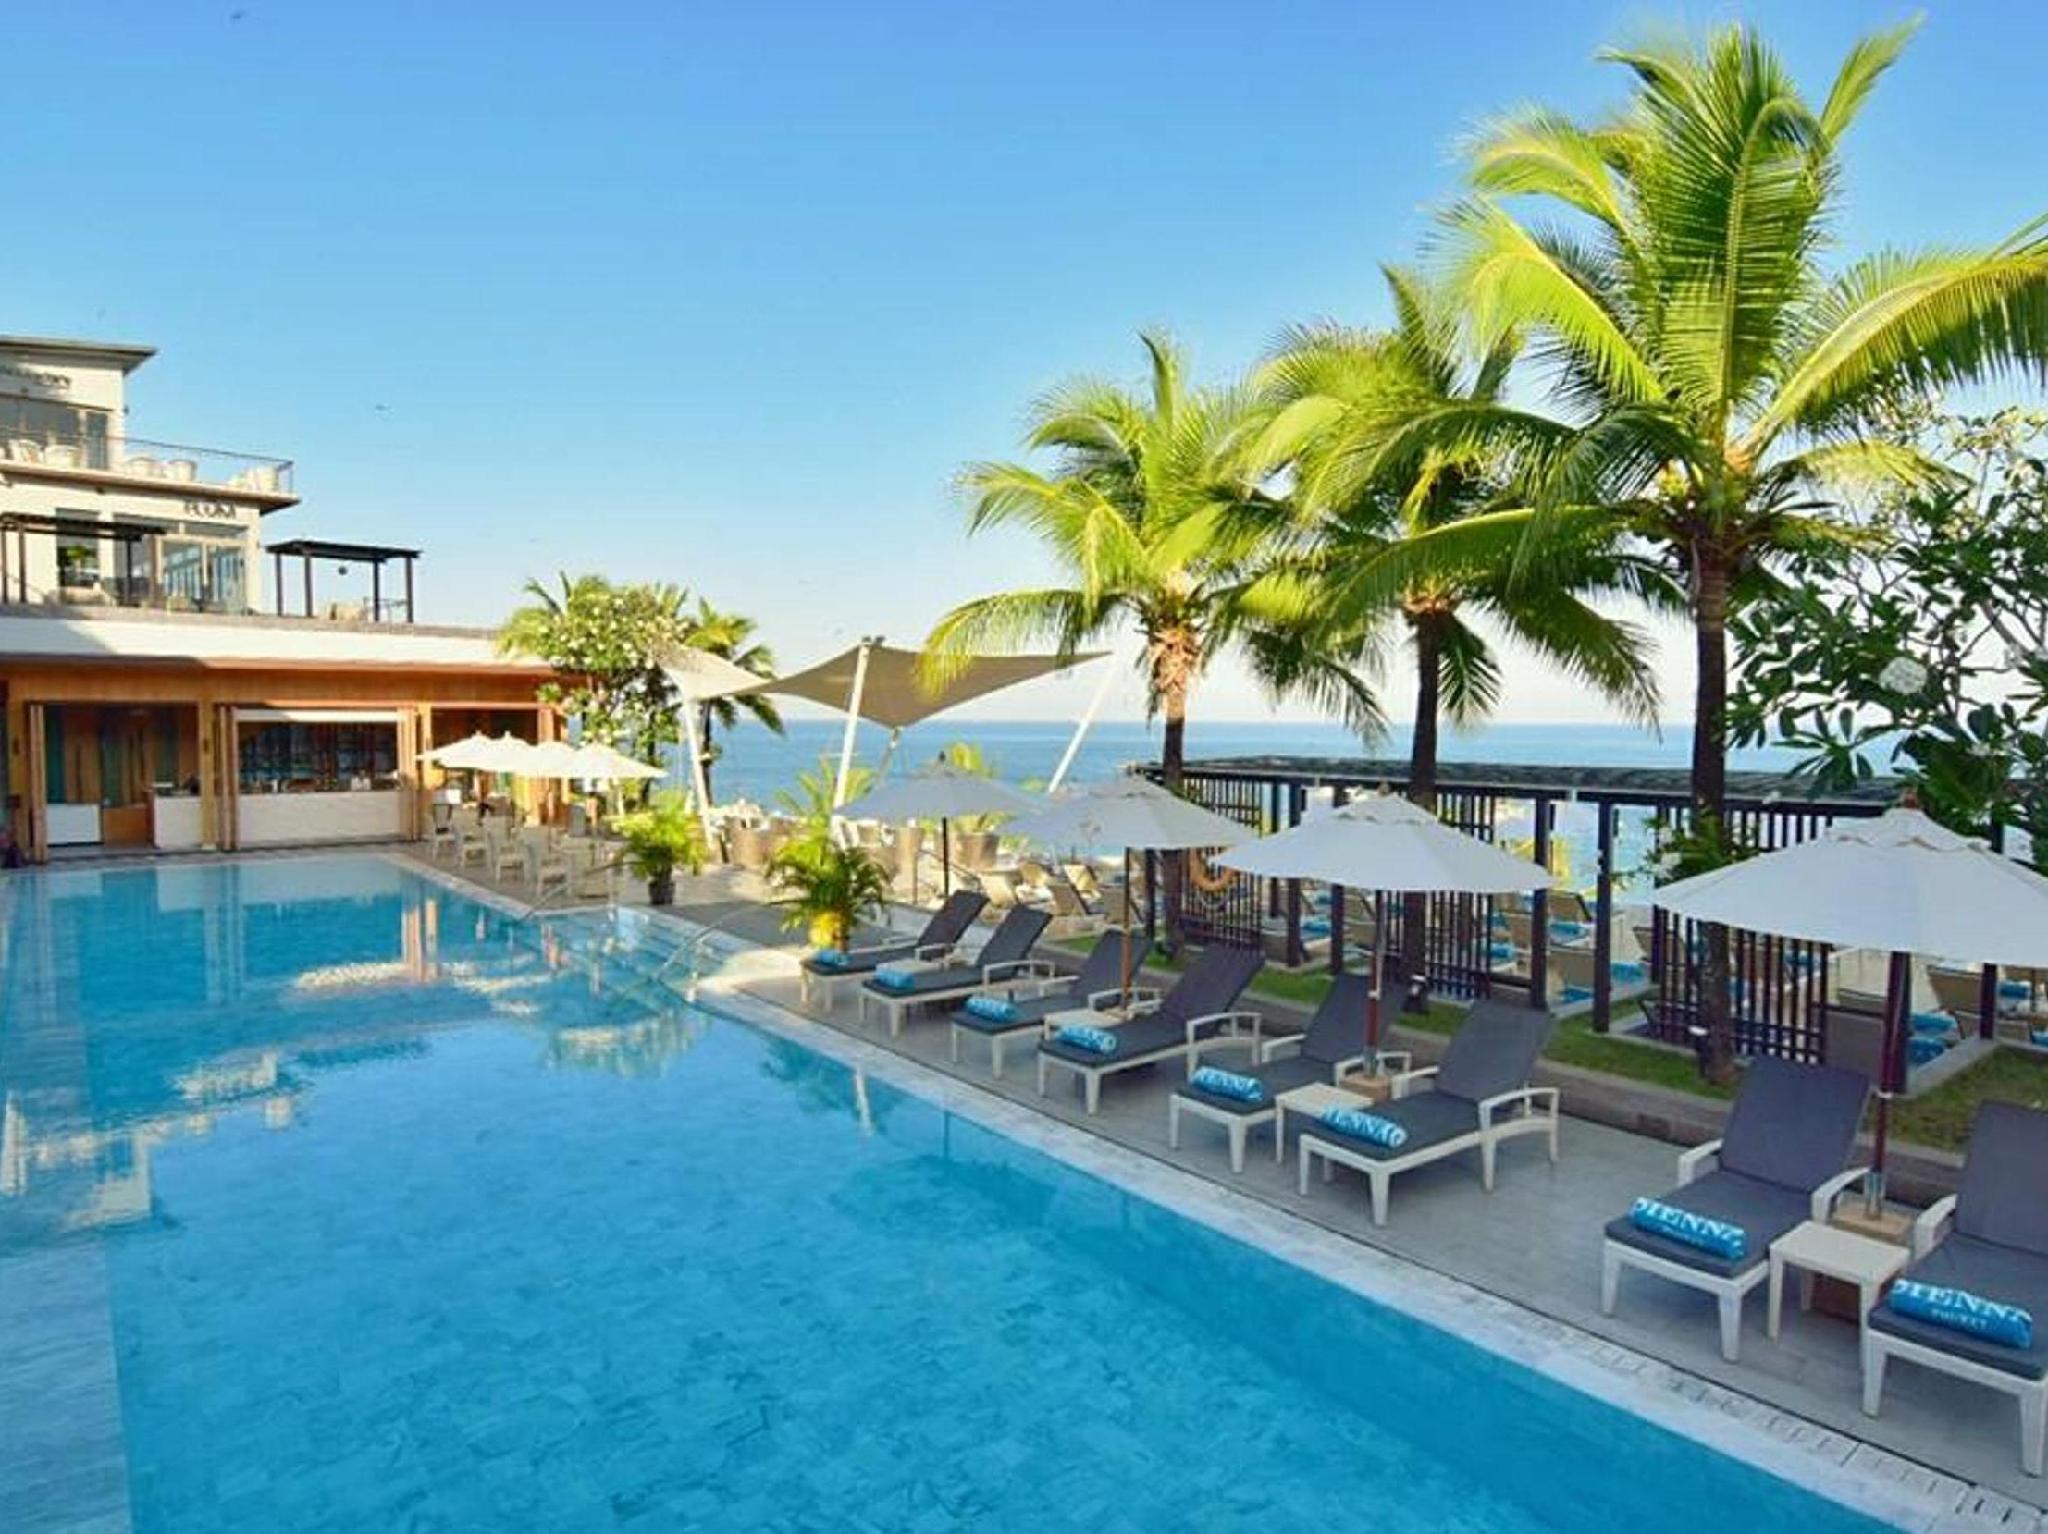 Cape Sienna Phuket Hotel and Villas27